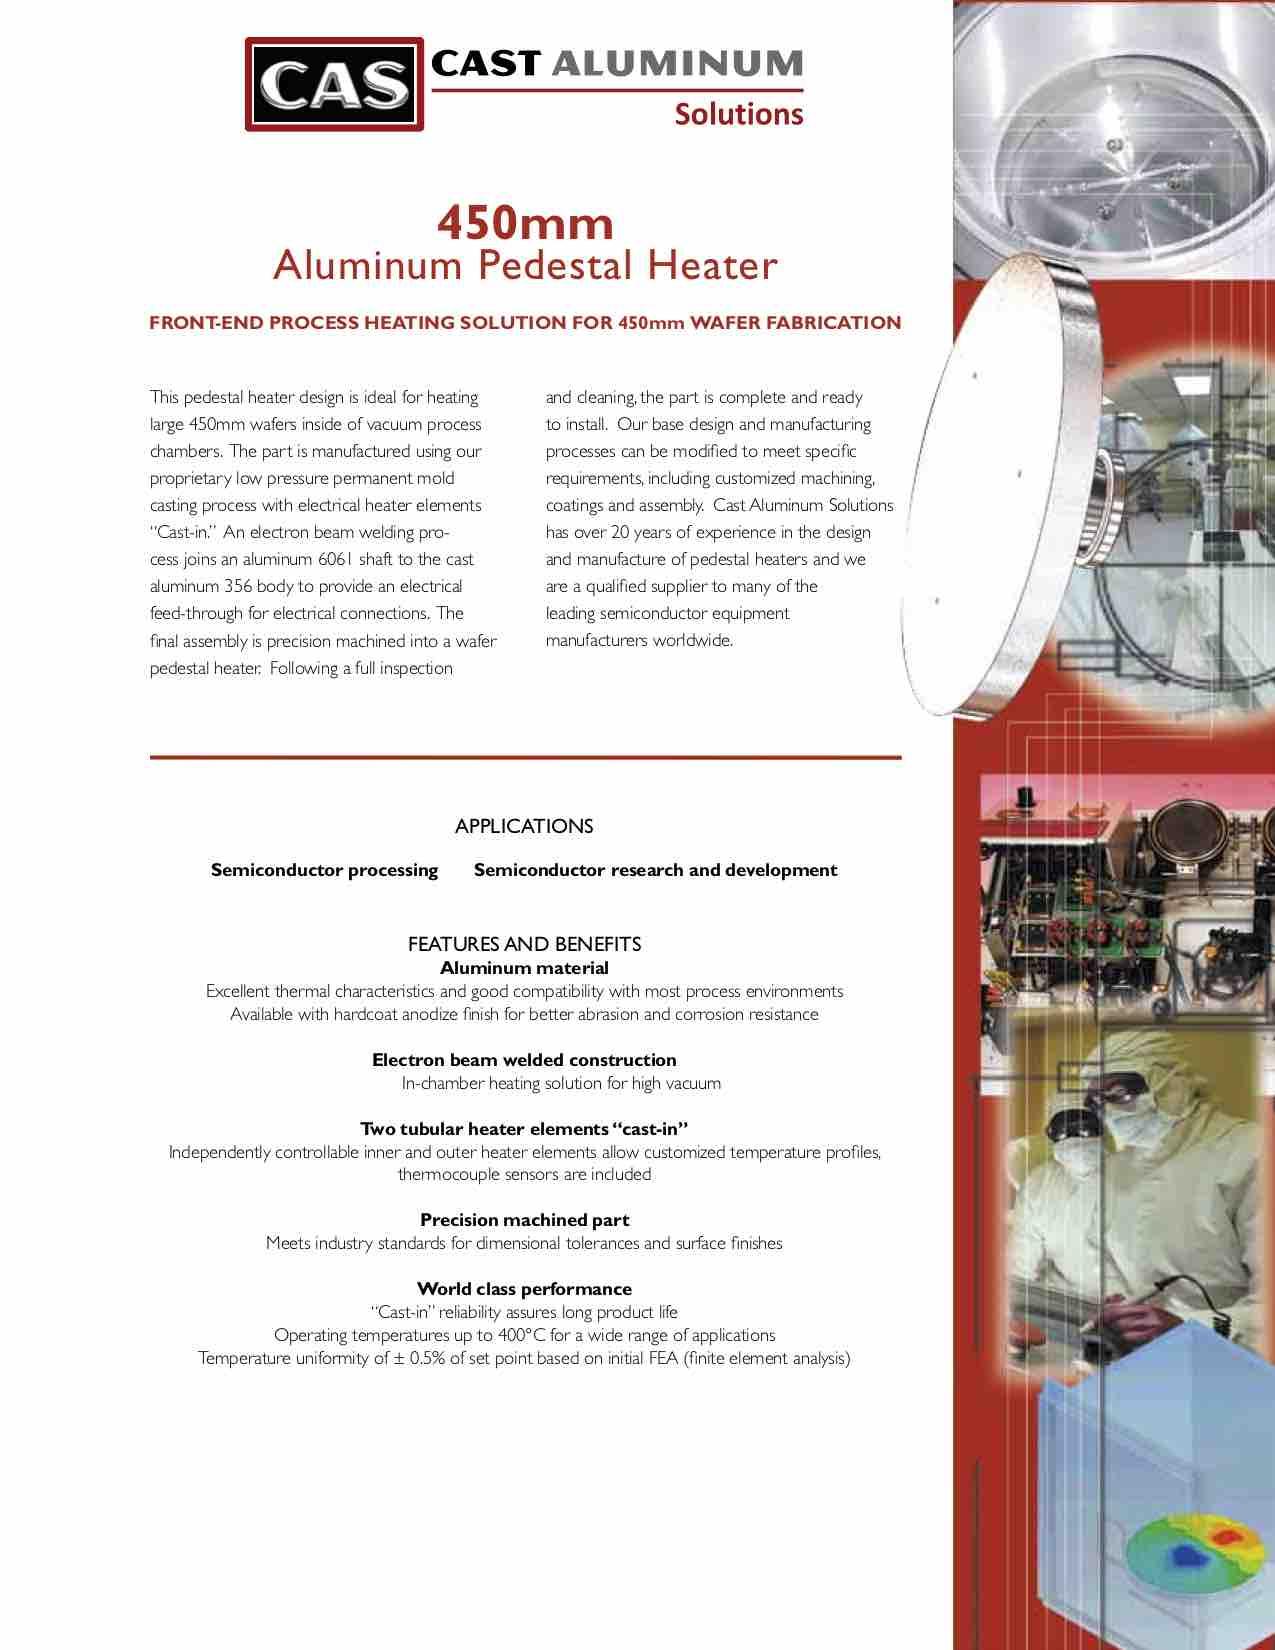 450 Mm Pedestal Heater Cast Aluminum Solutions (dragged)